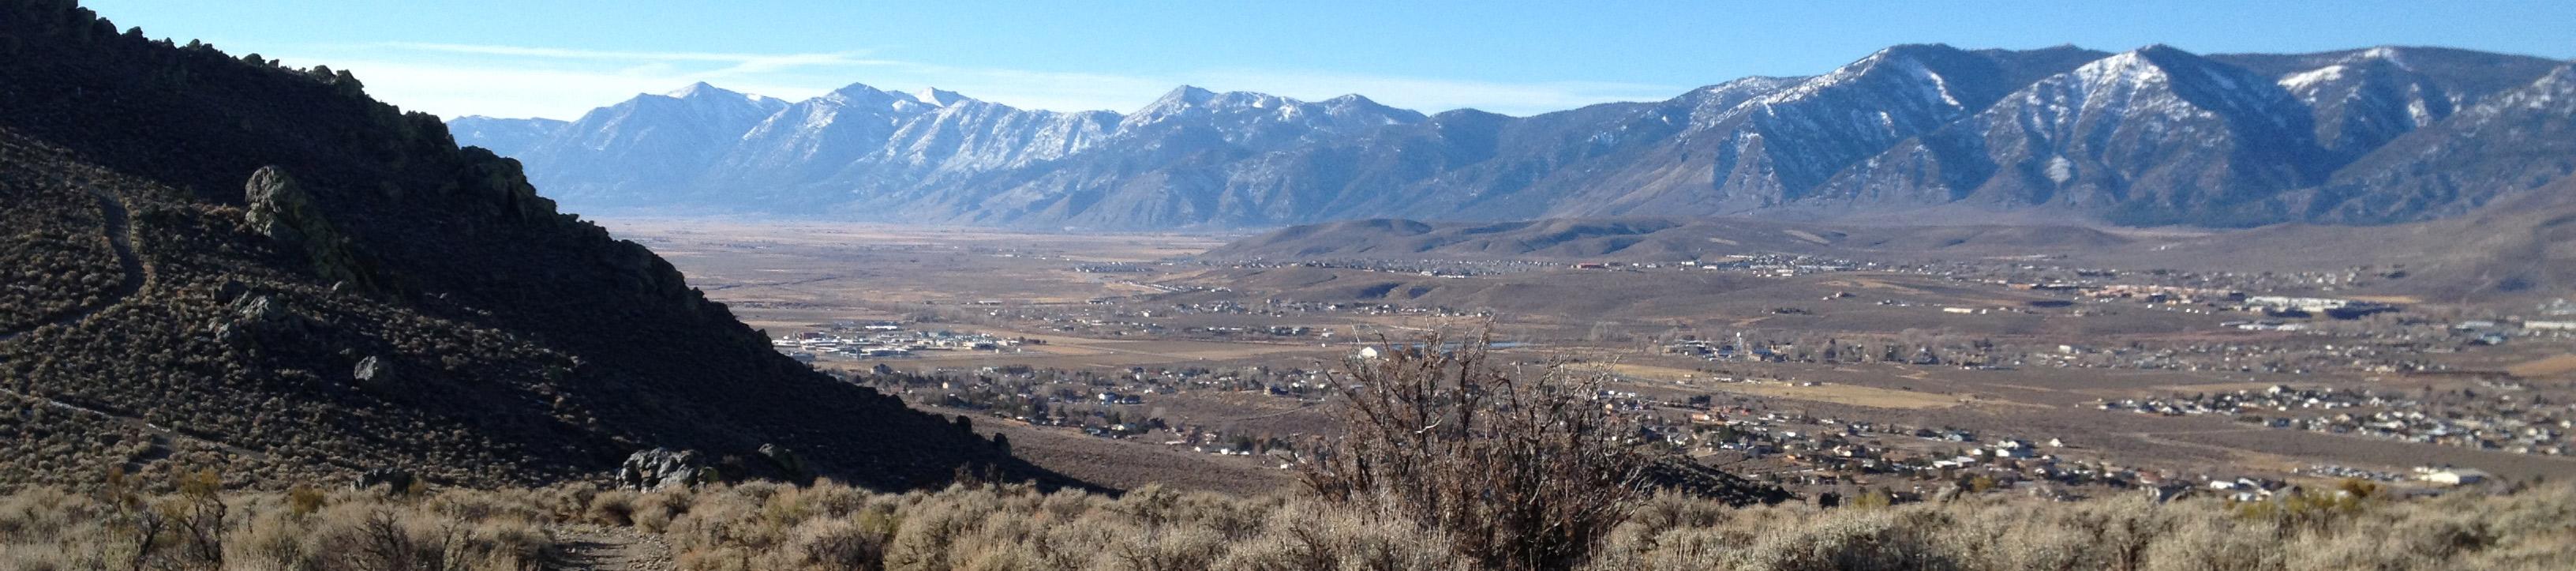 South Carson City Mountains